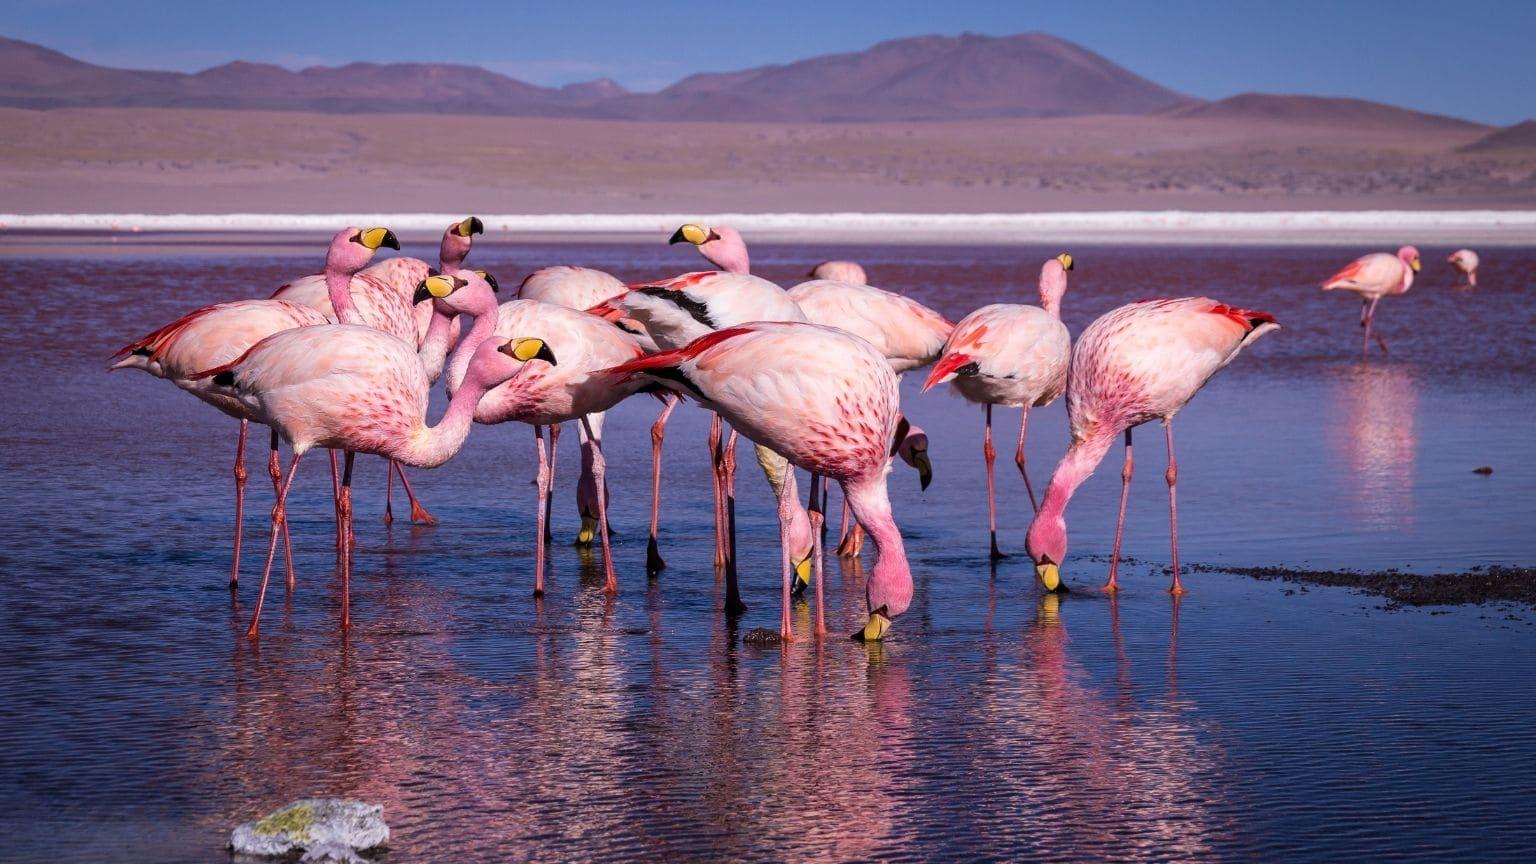 Pink flamingos in Bolivia